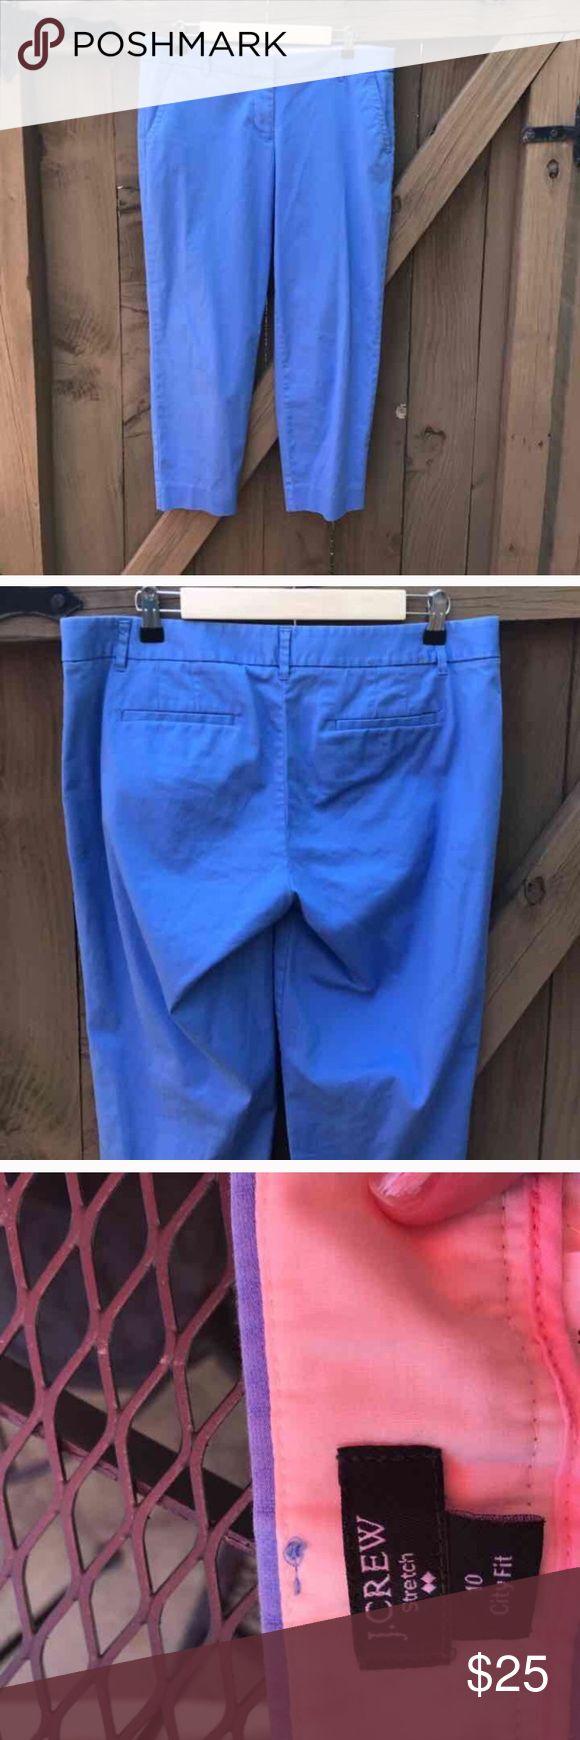 J. Crew size 10 blue city fit cropped pants J. Crew size 10 blue city fit cropped pants: LOCATION: bin 5 J. Crew Pants Ankle & Cropped